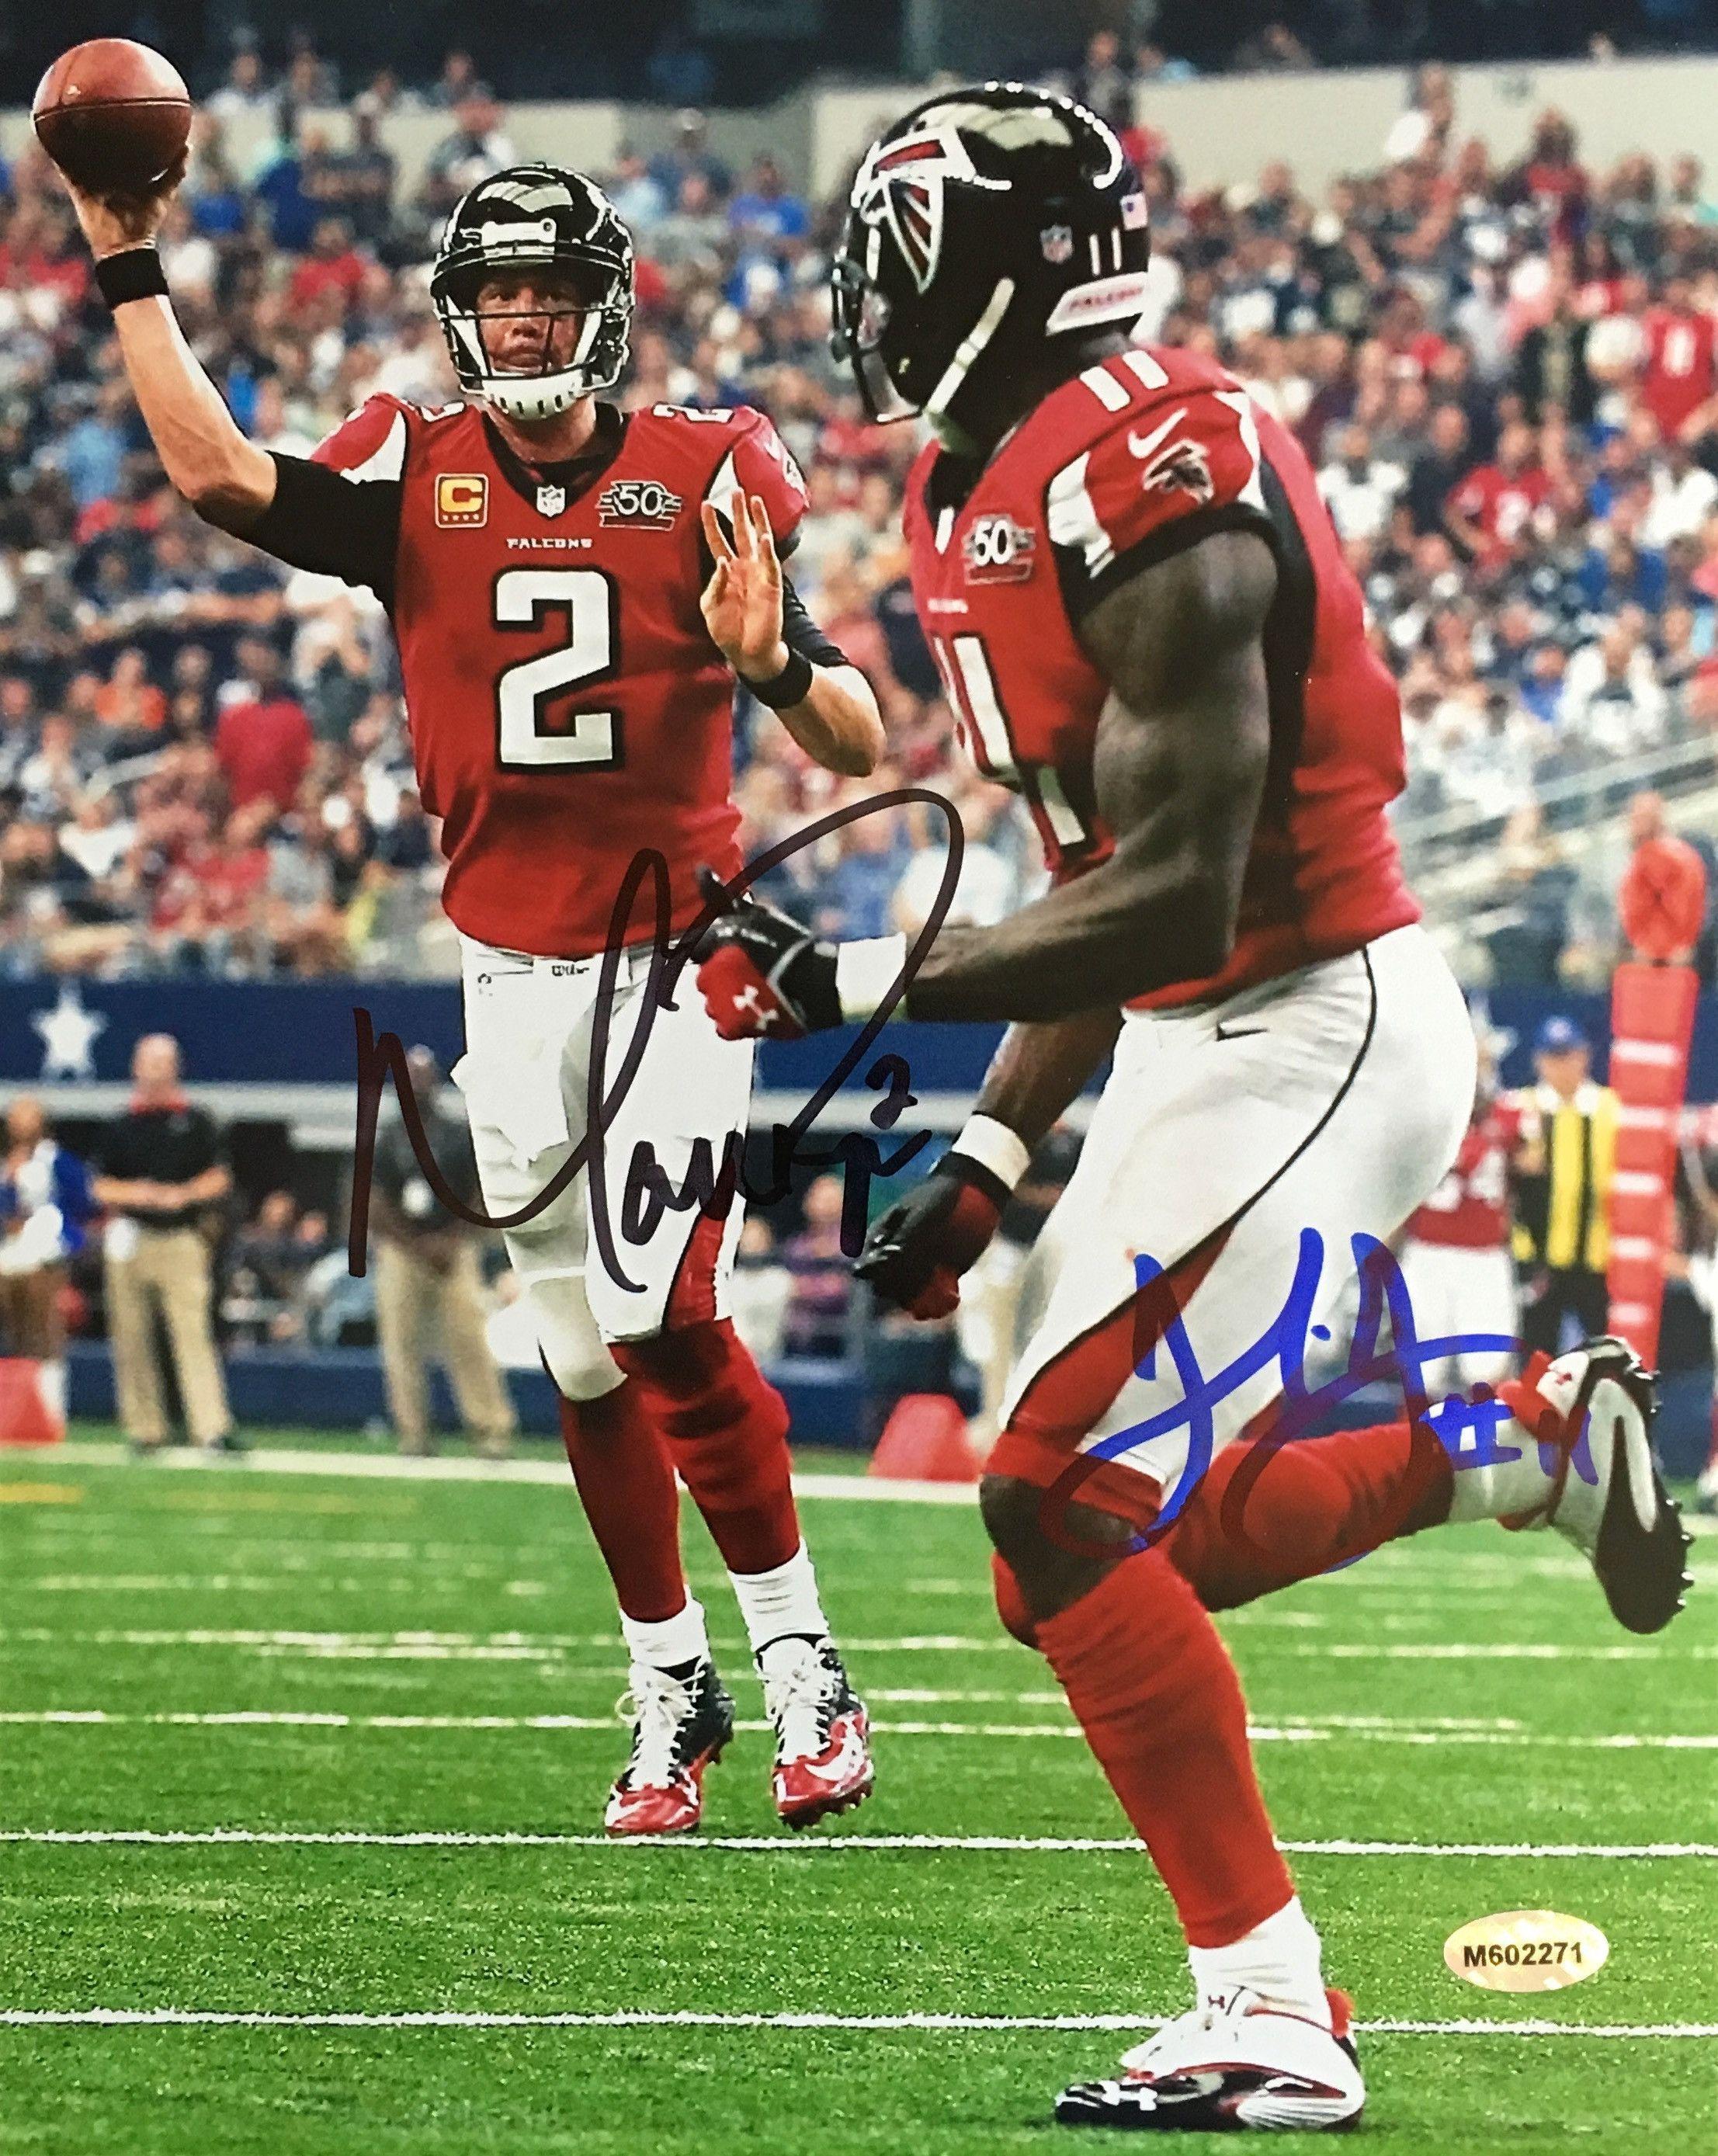 Beautifully Dual Signed 8x10 Photo Featuring The Autographs Of Nfl Mvp Matt Ryan And Star Wr Julio Jones The Si Julio Jones Atlanta Falcons Football Matt Ryan